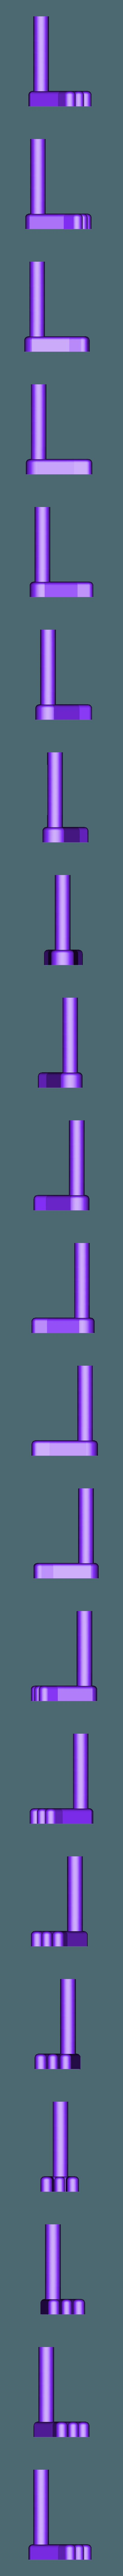 Leg_Right.stl Download free STL file Rainbow Toucan • 3D printing template, 3rdesignworks